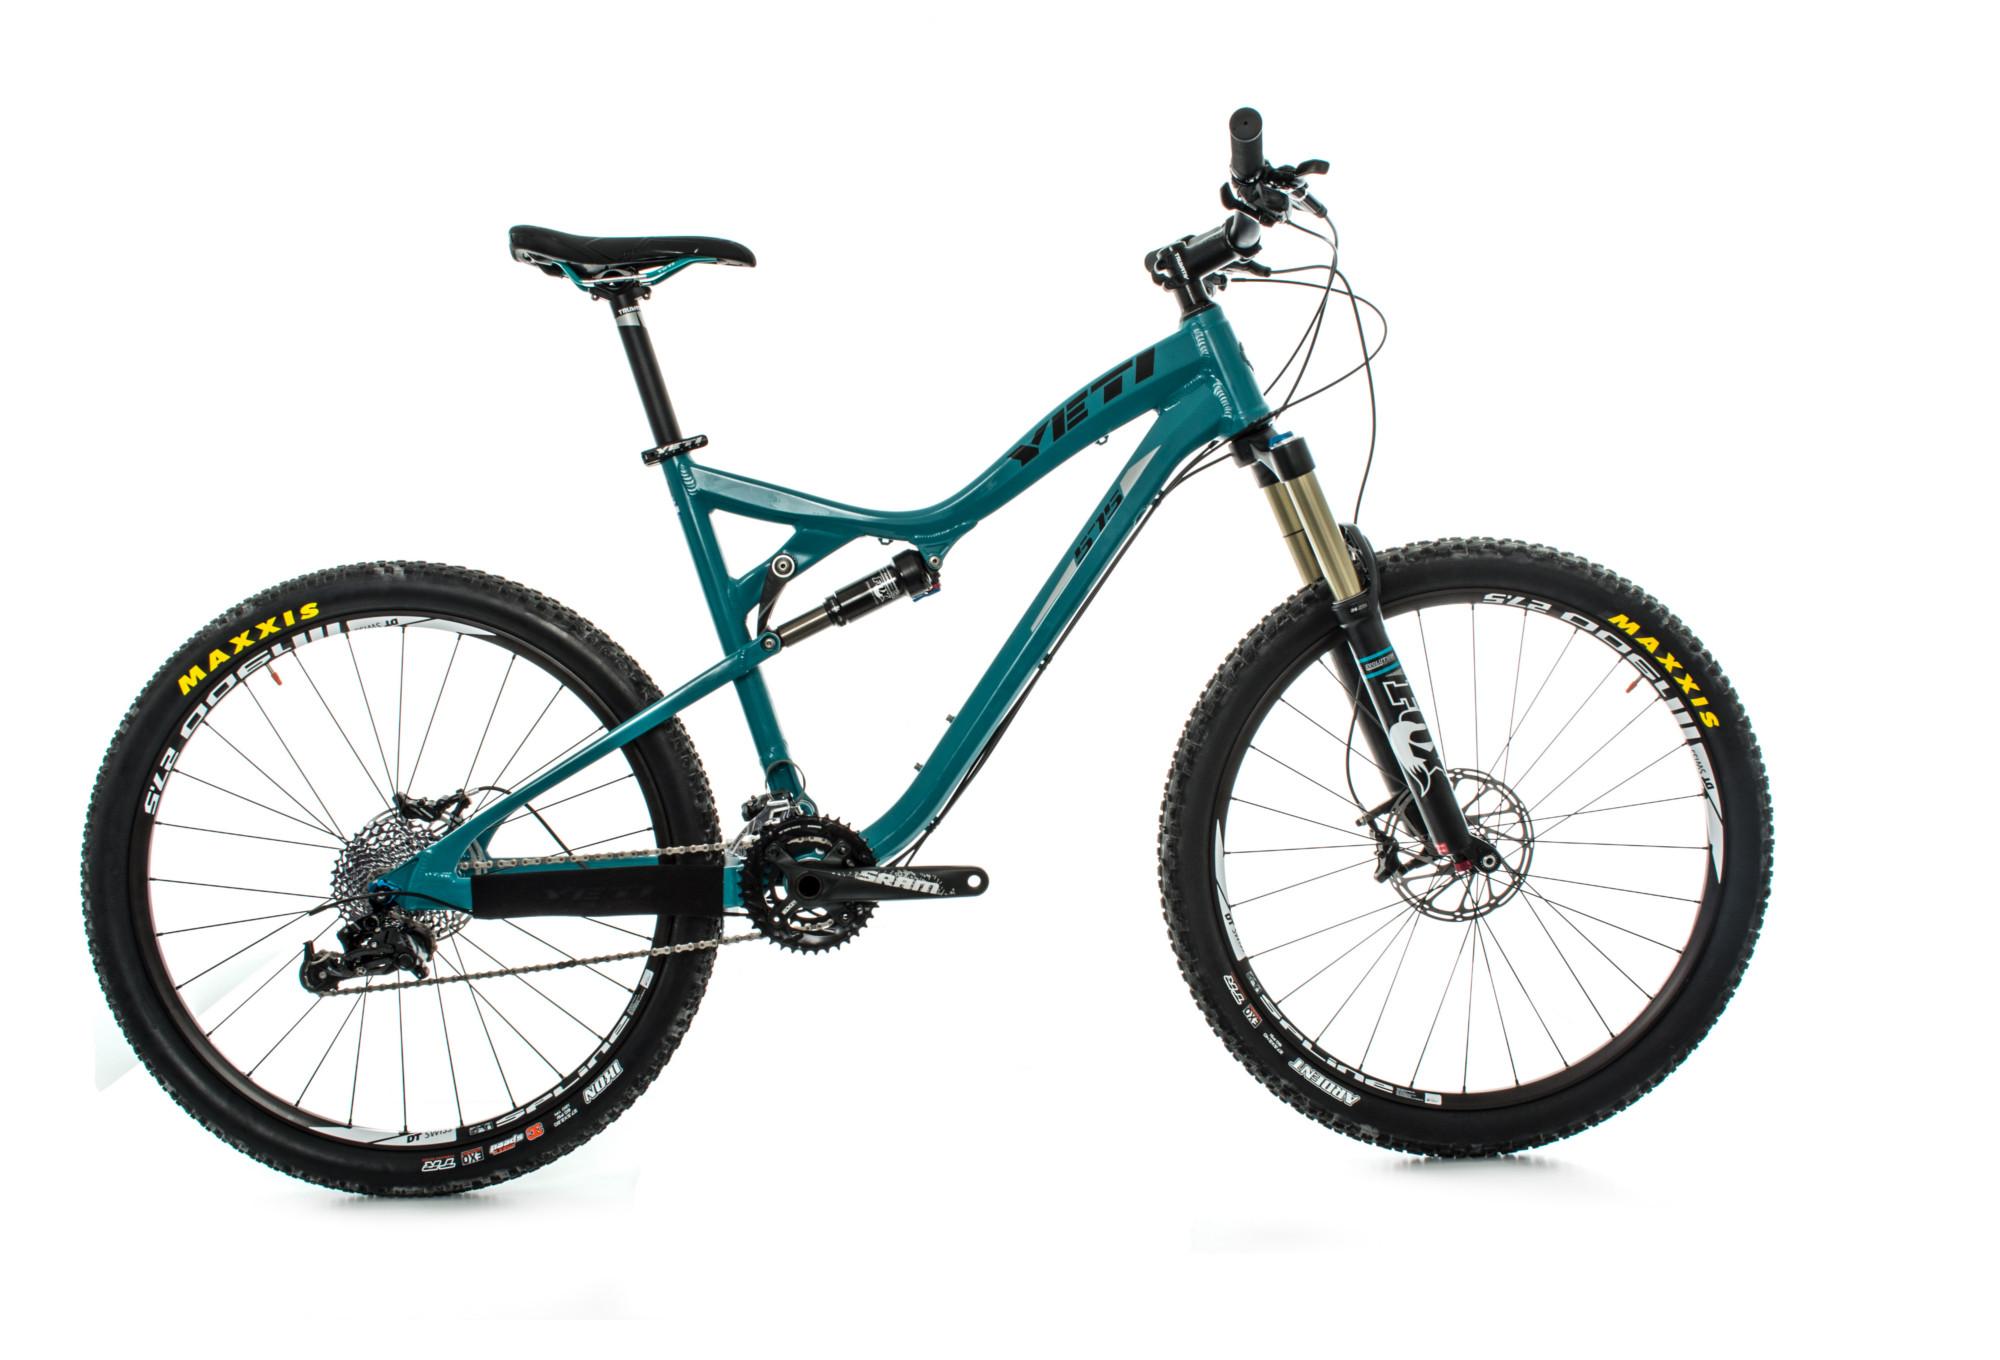 YETI 2014 575 Turquoise 27.5\'\' 146mm + Enduro Kit Complete Bike ...